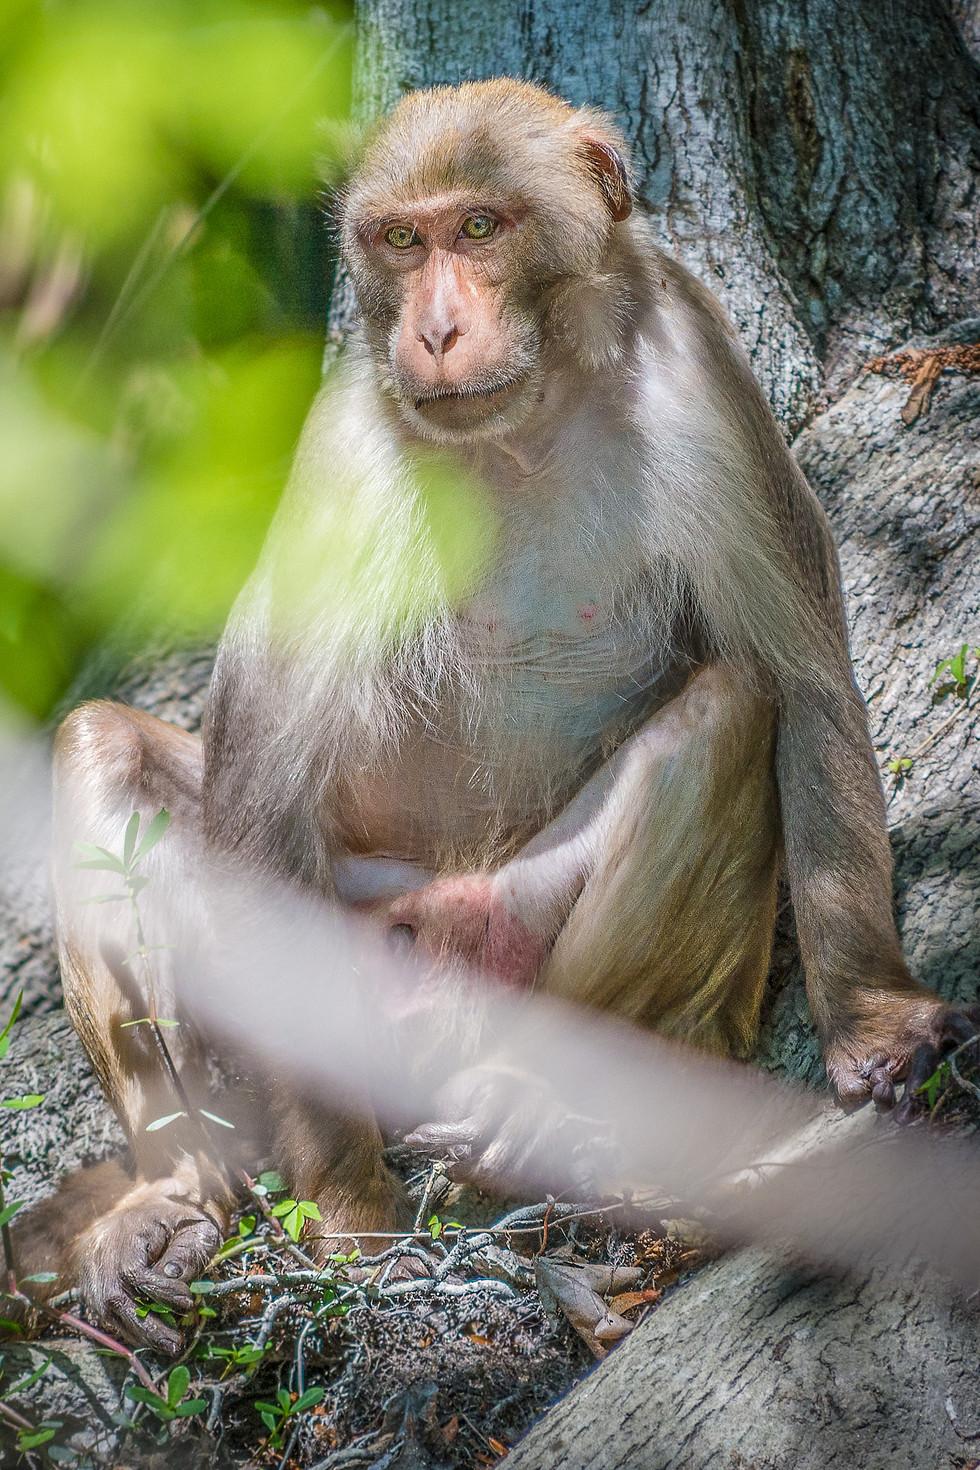 Contemplative monkey